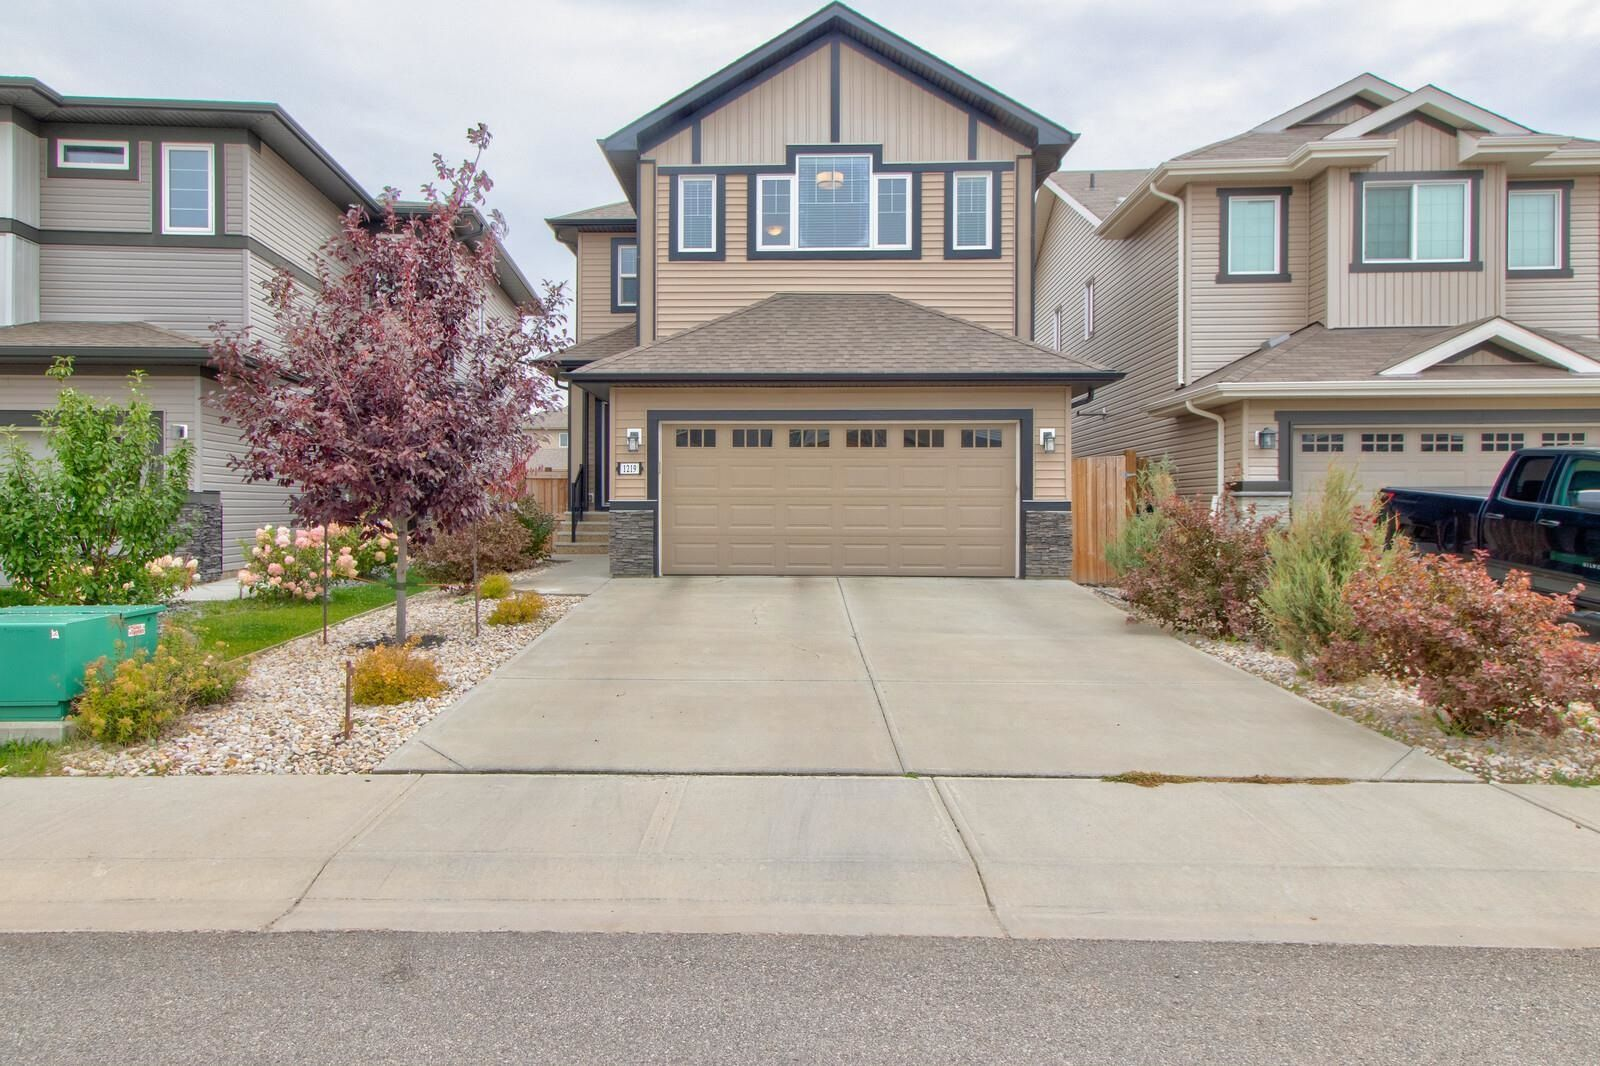 Main Photo: 1219 164 Street in Edmonton: Zone 56 House for sale : MLS®# E4252530